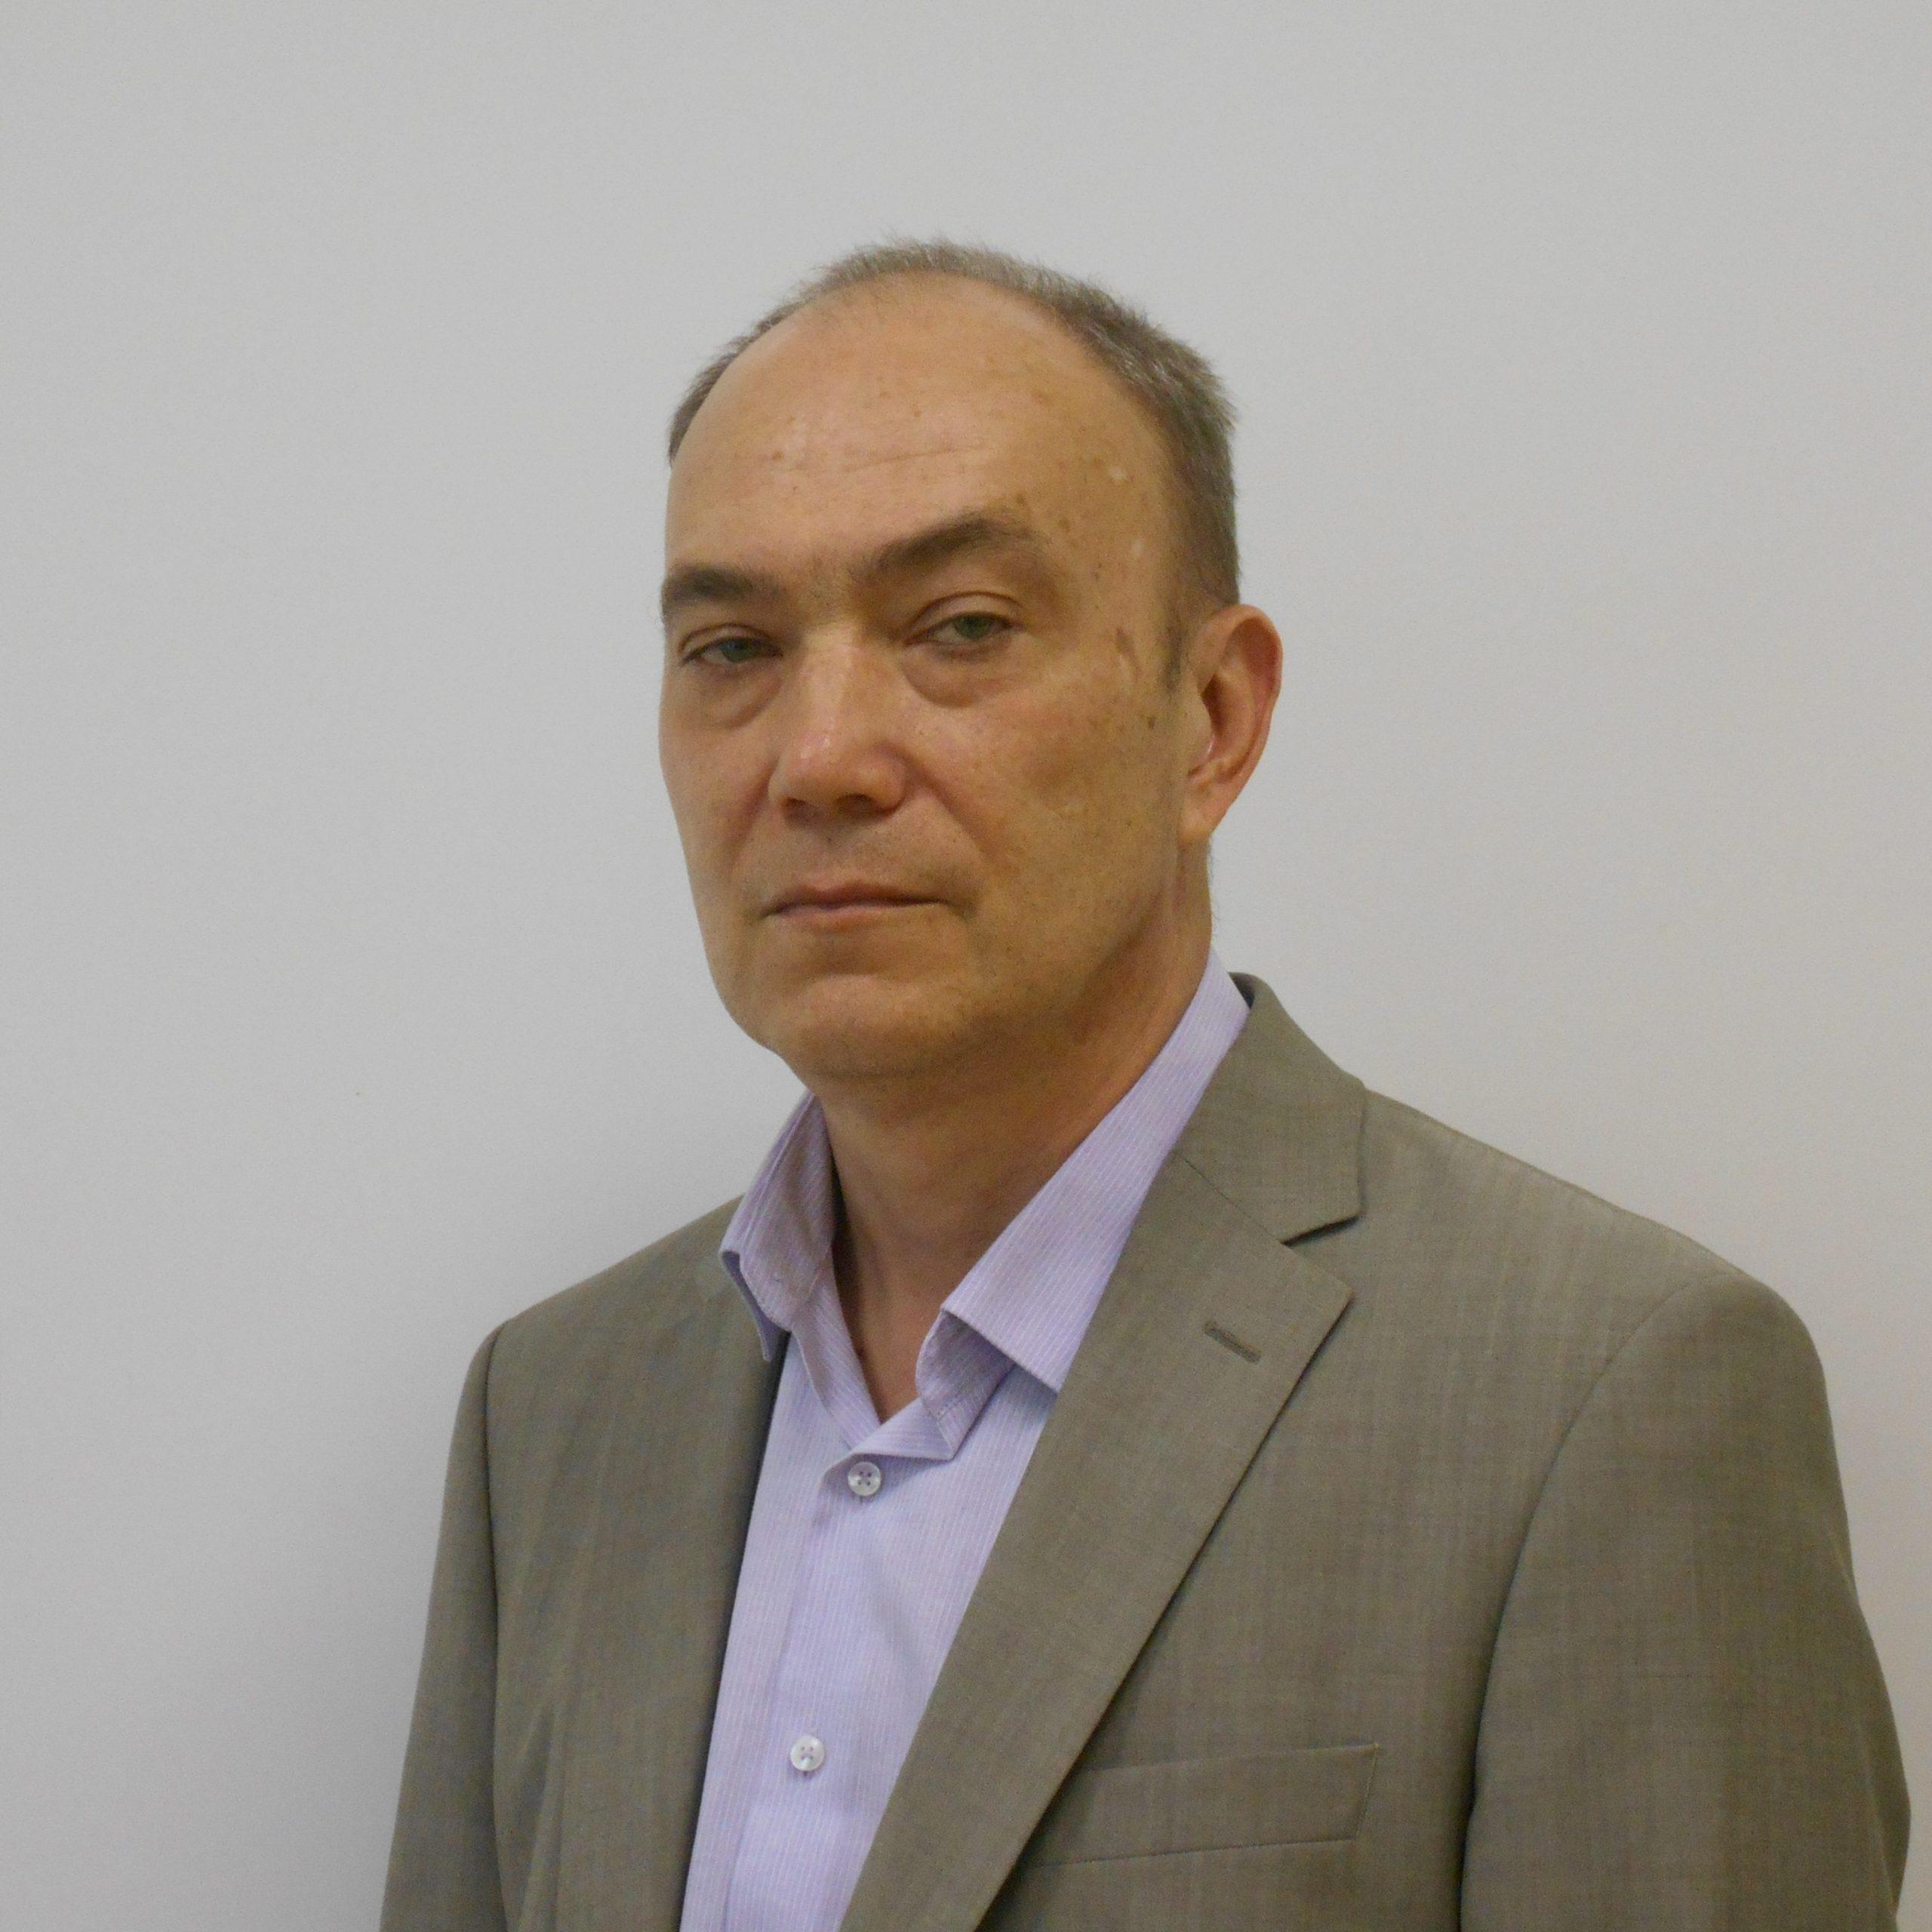 Mikhail Voropaev